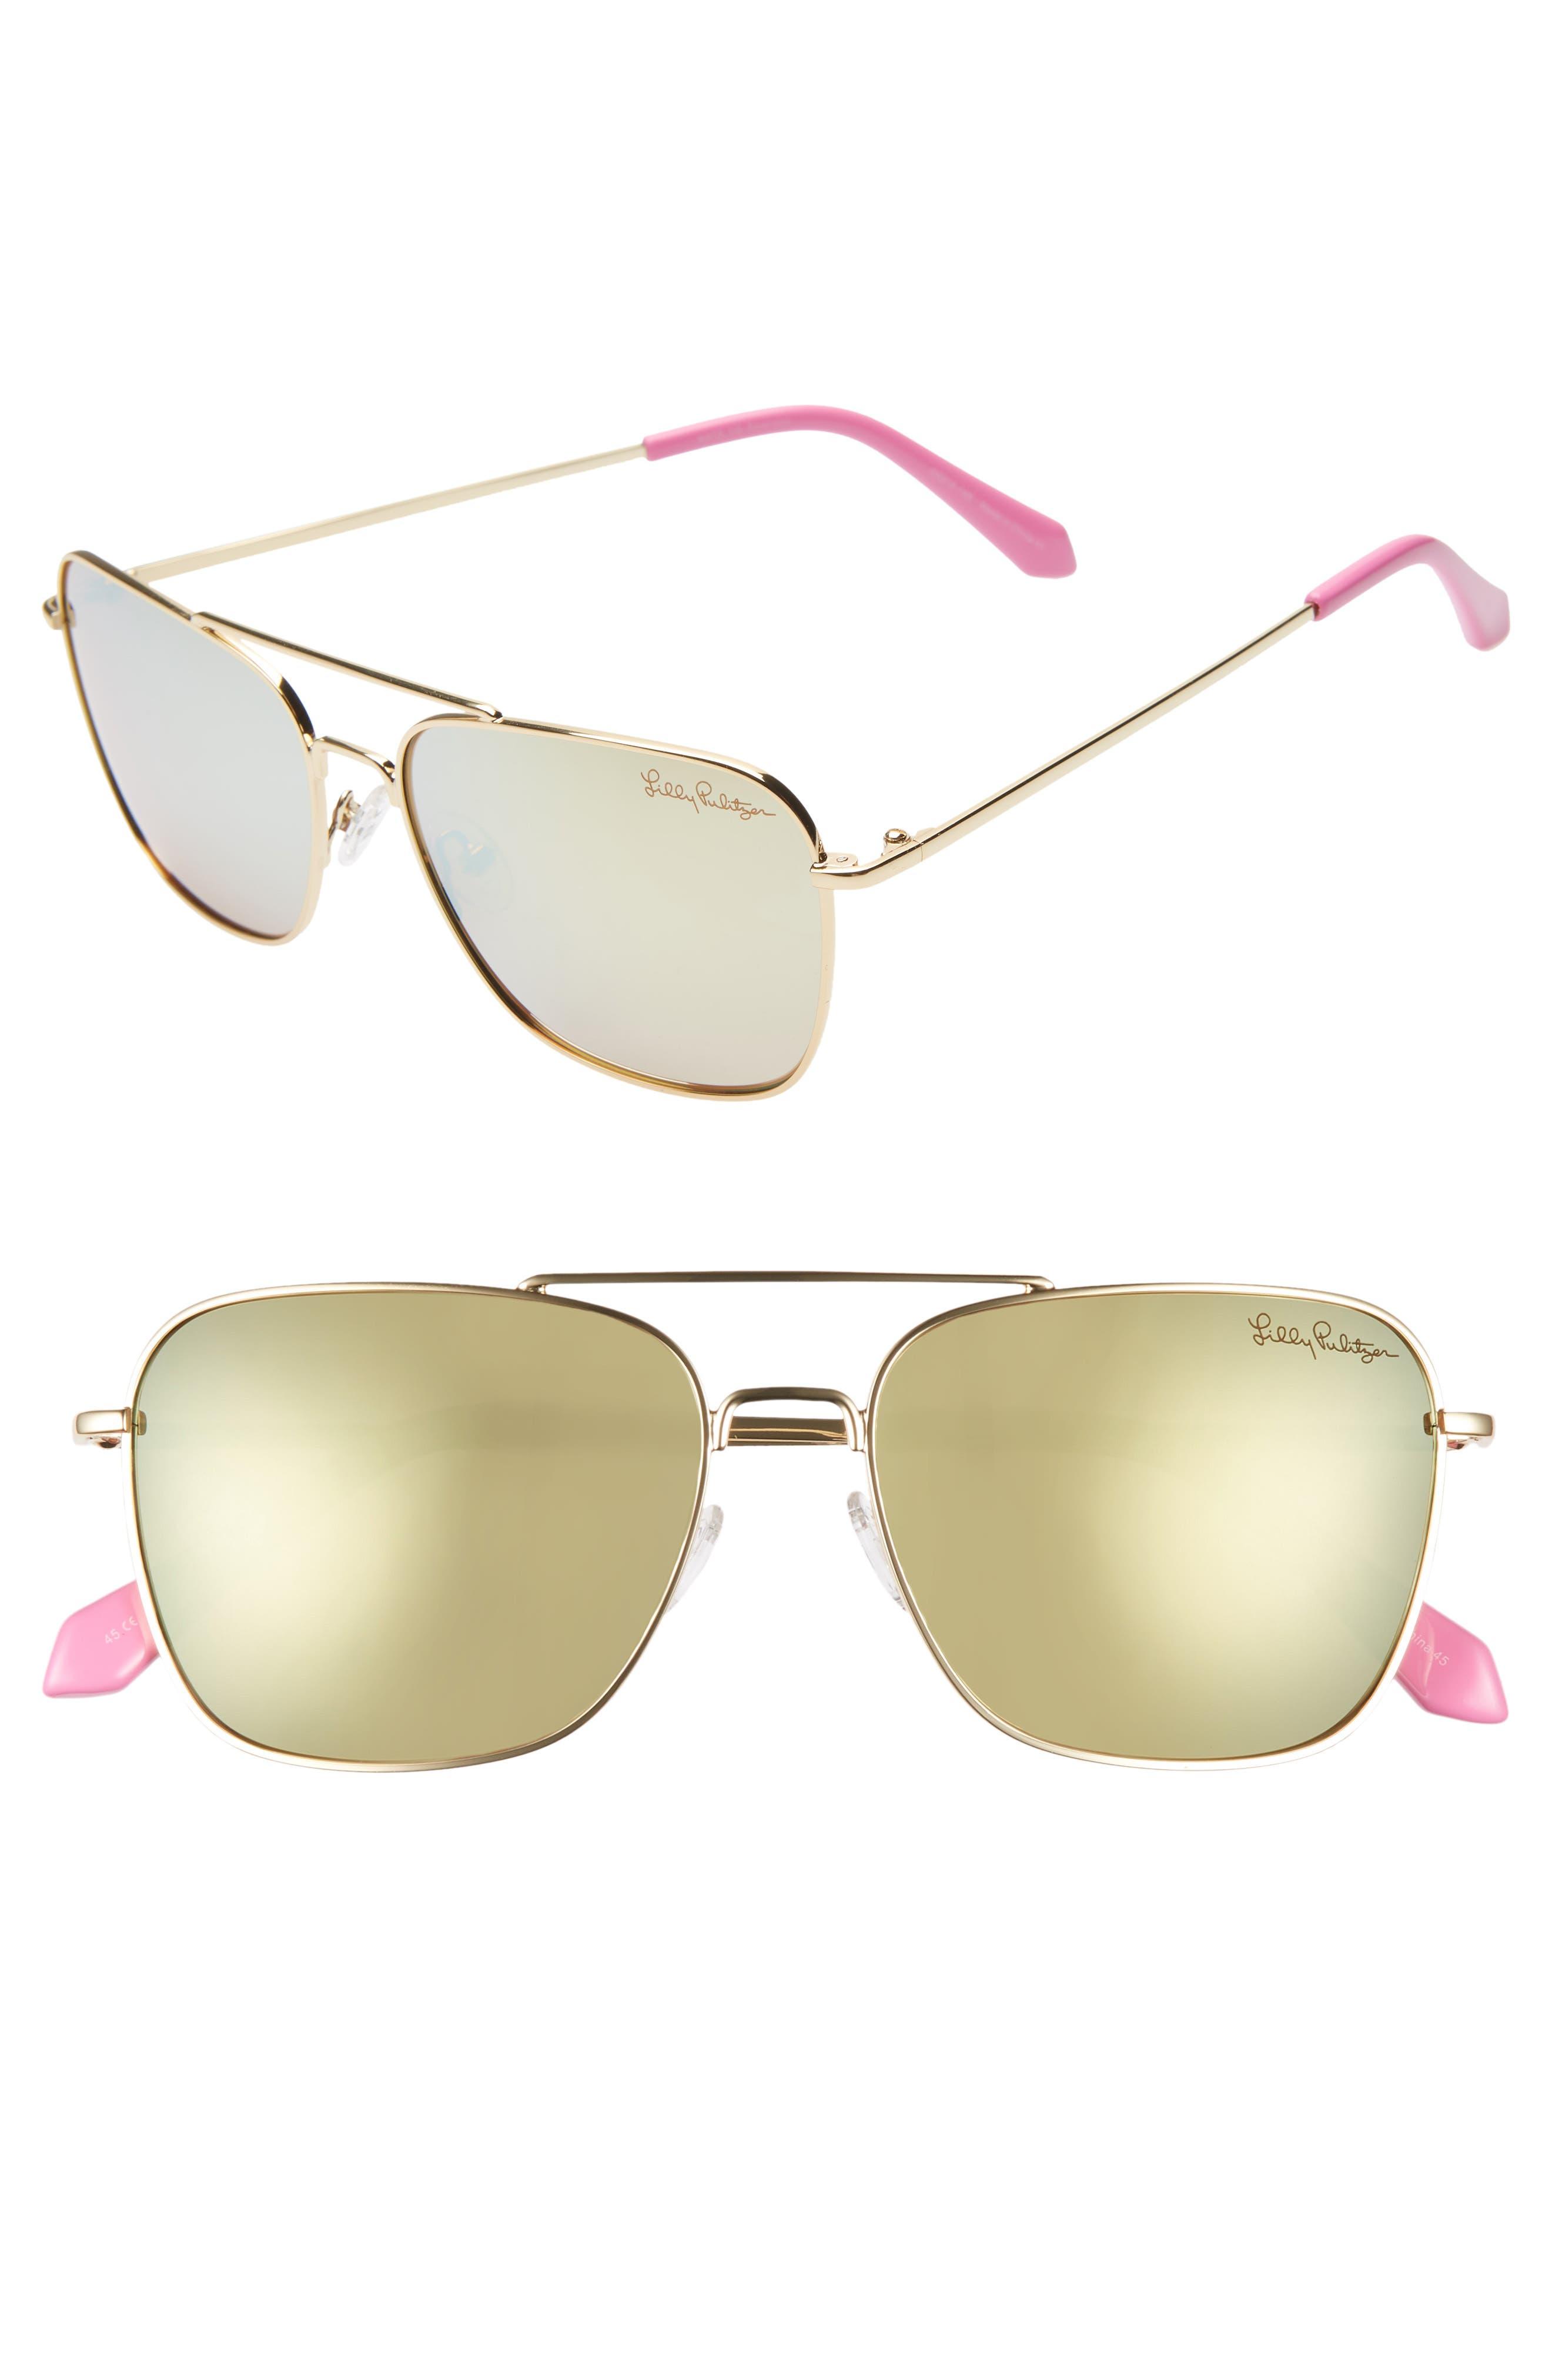 Lilly Pulitzer Kate 55Mm Polarized Aviator Sunglasses - Shiny Gold/ White Enamel